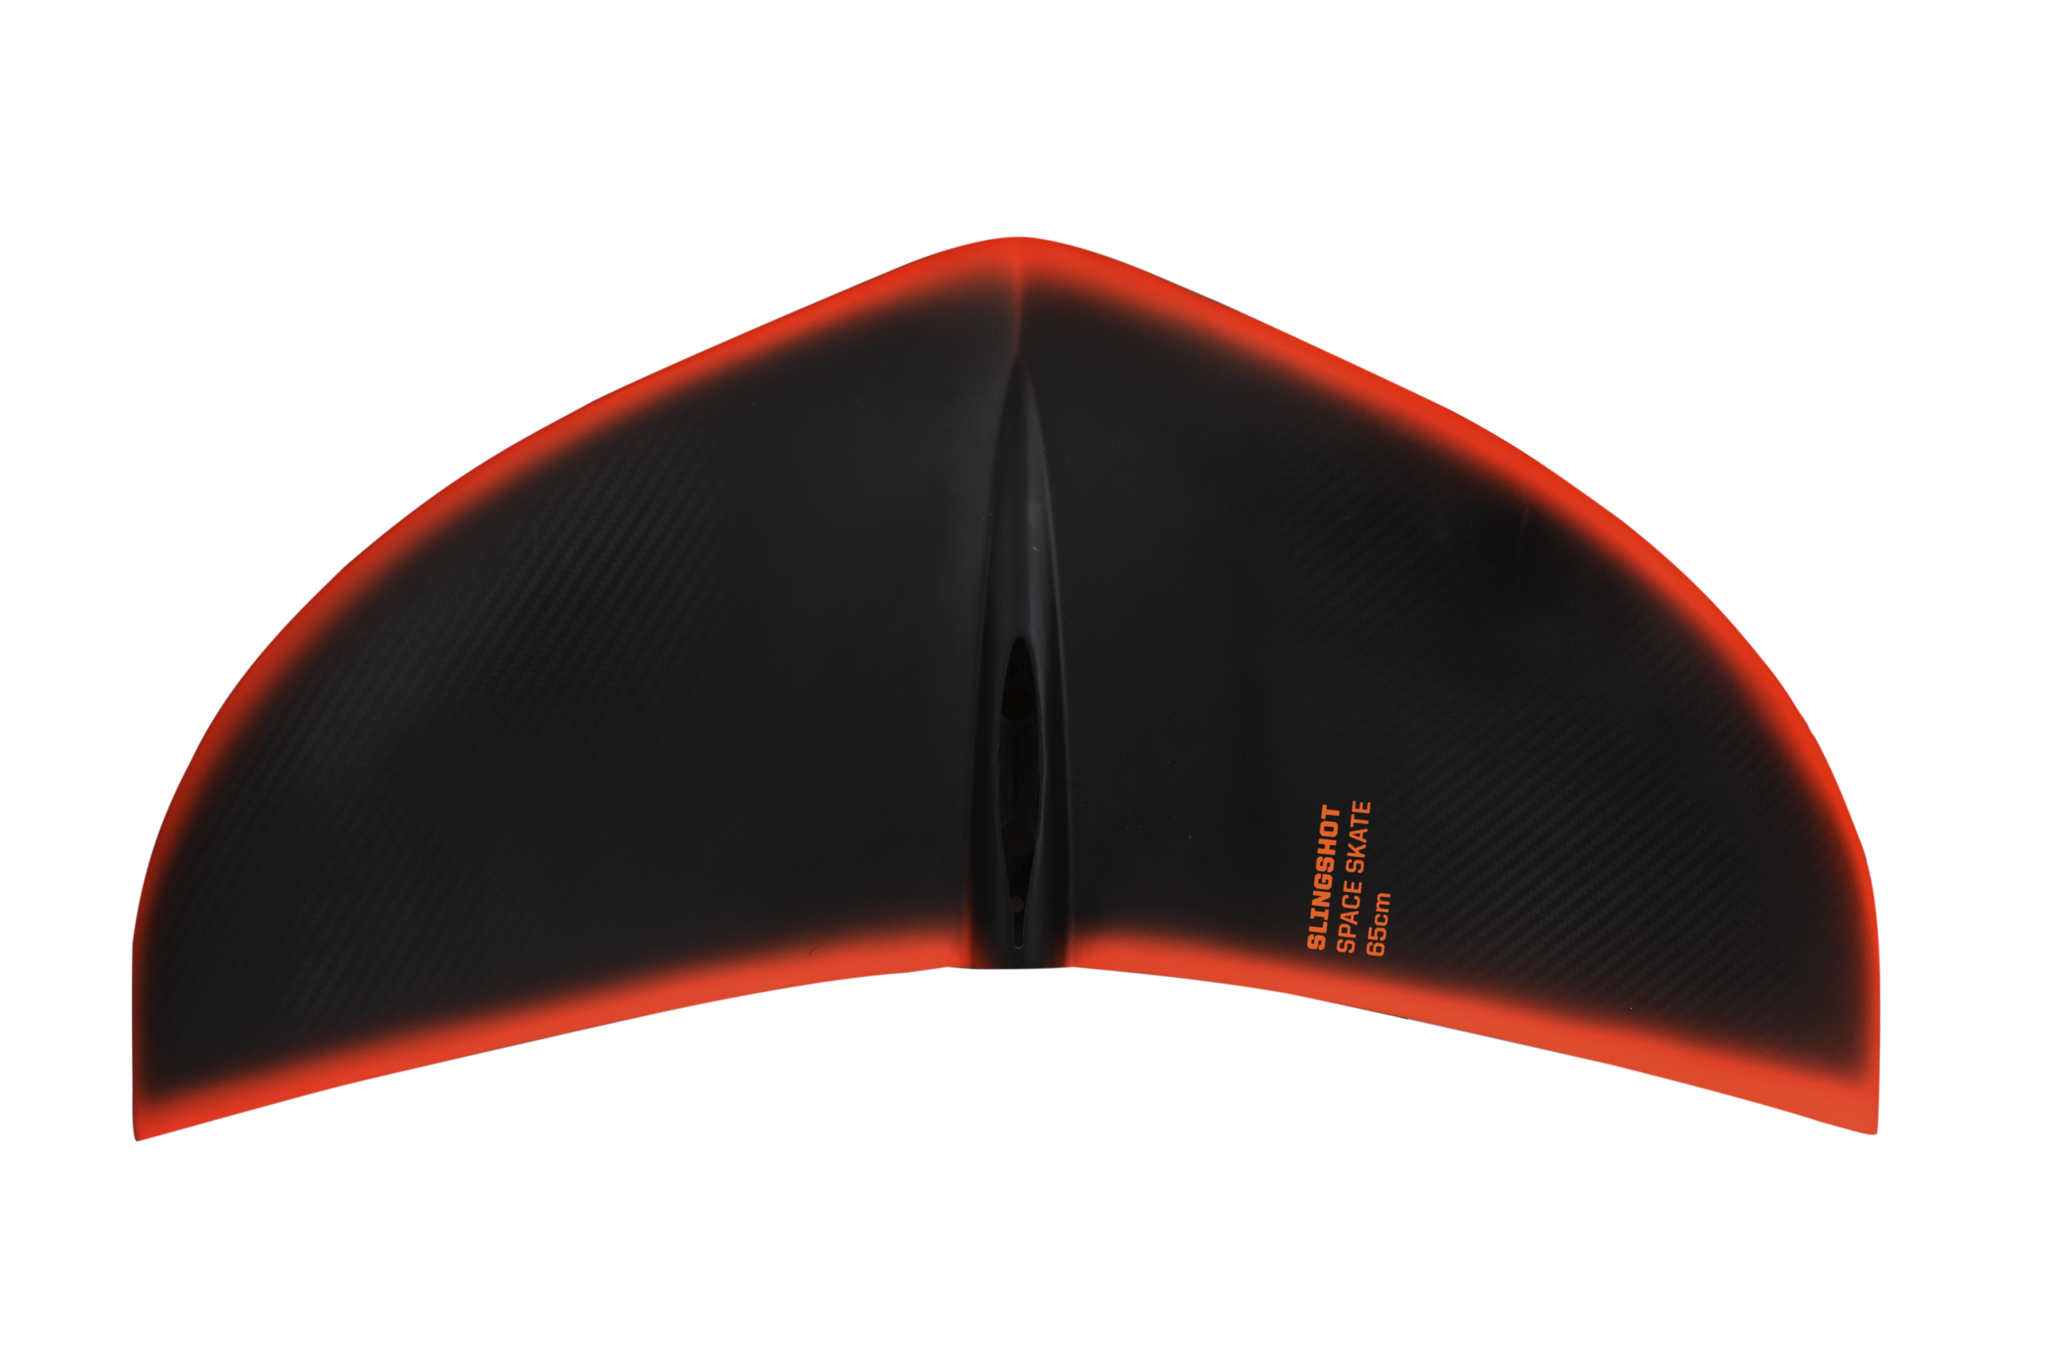 2019 Slingshot Hover Glide FKite Foil